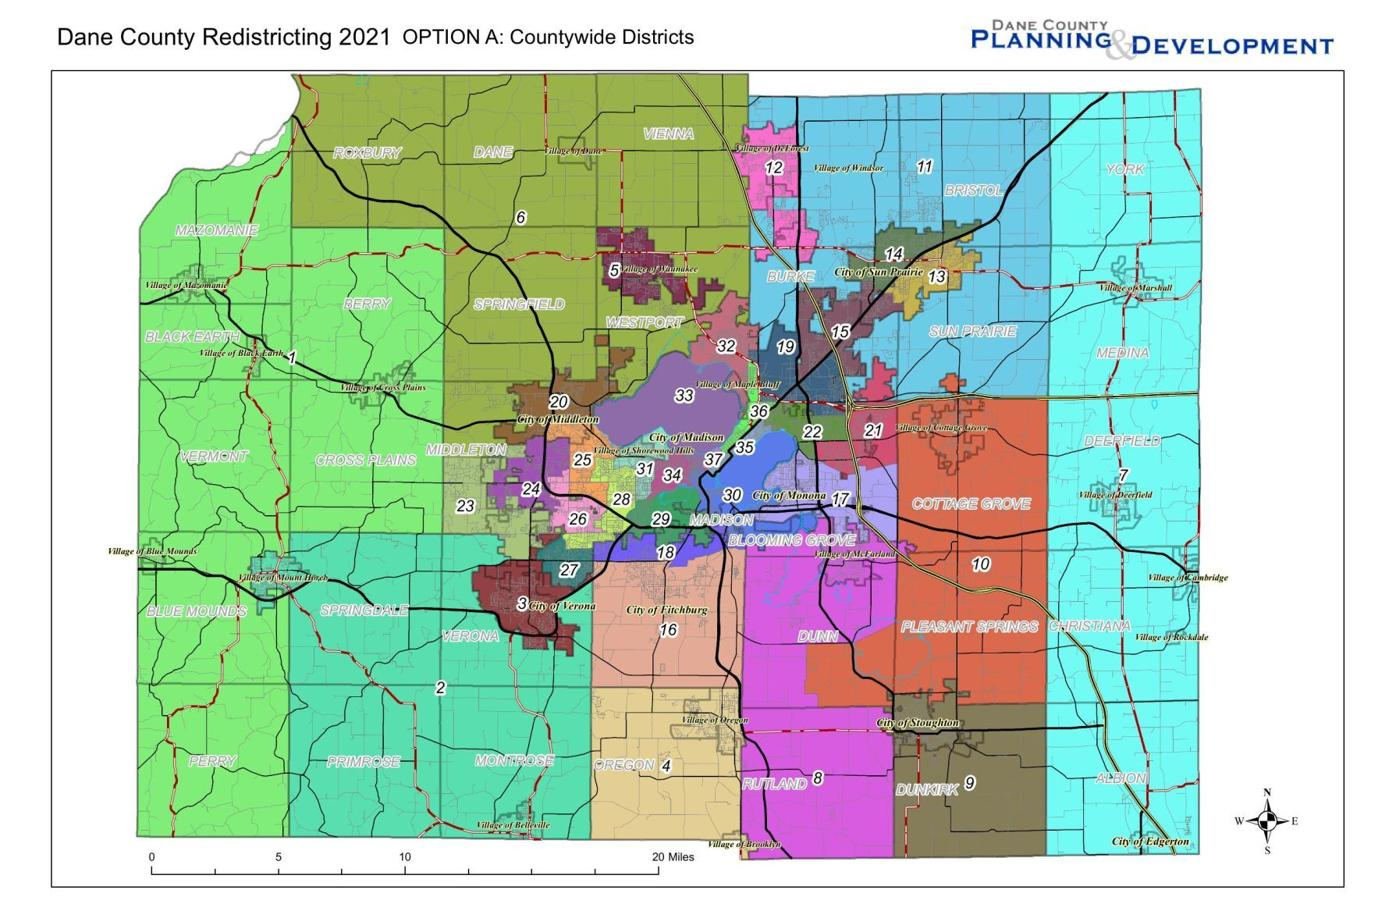 Dane County Redistricting Map Option A.pdf